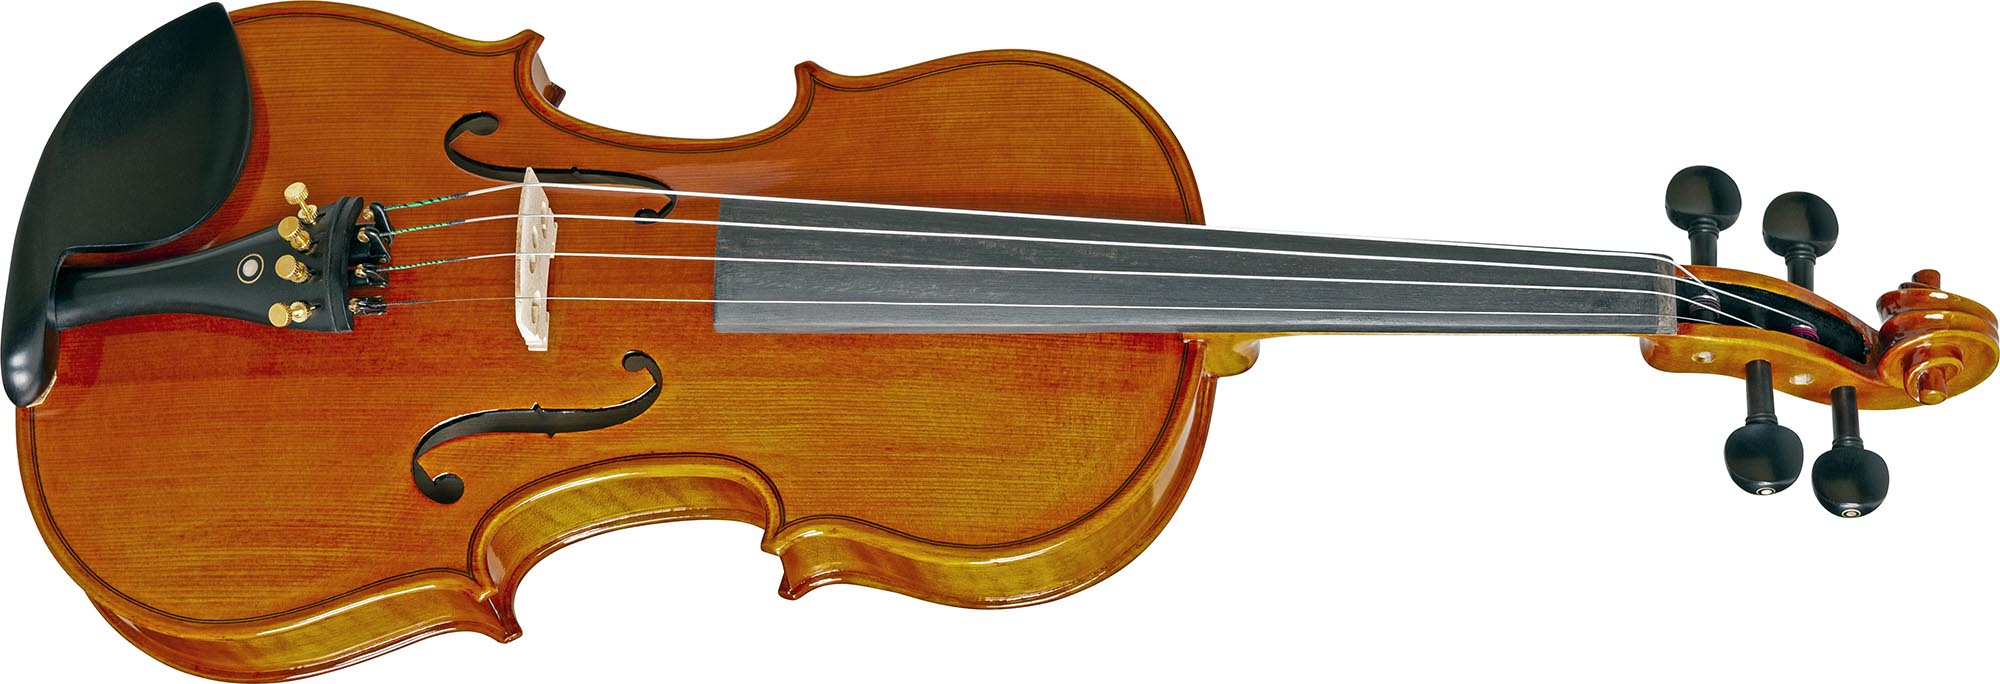 vk844 violino eagle vk844 visao frontal